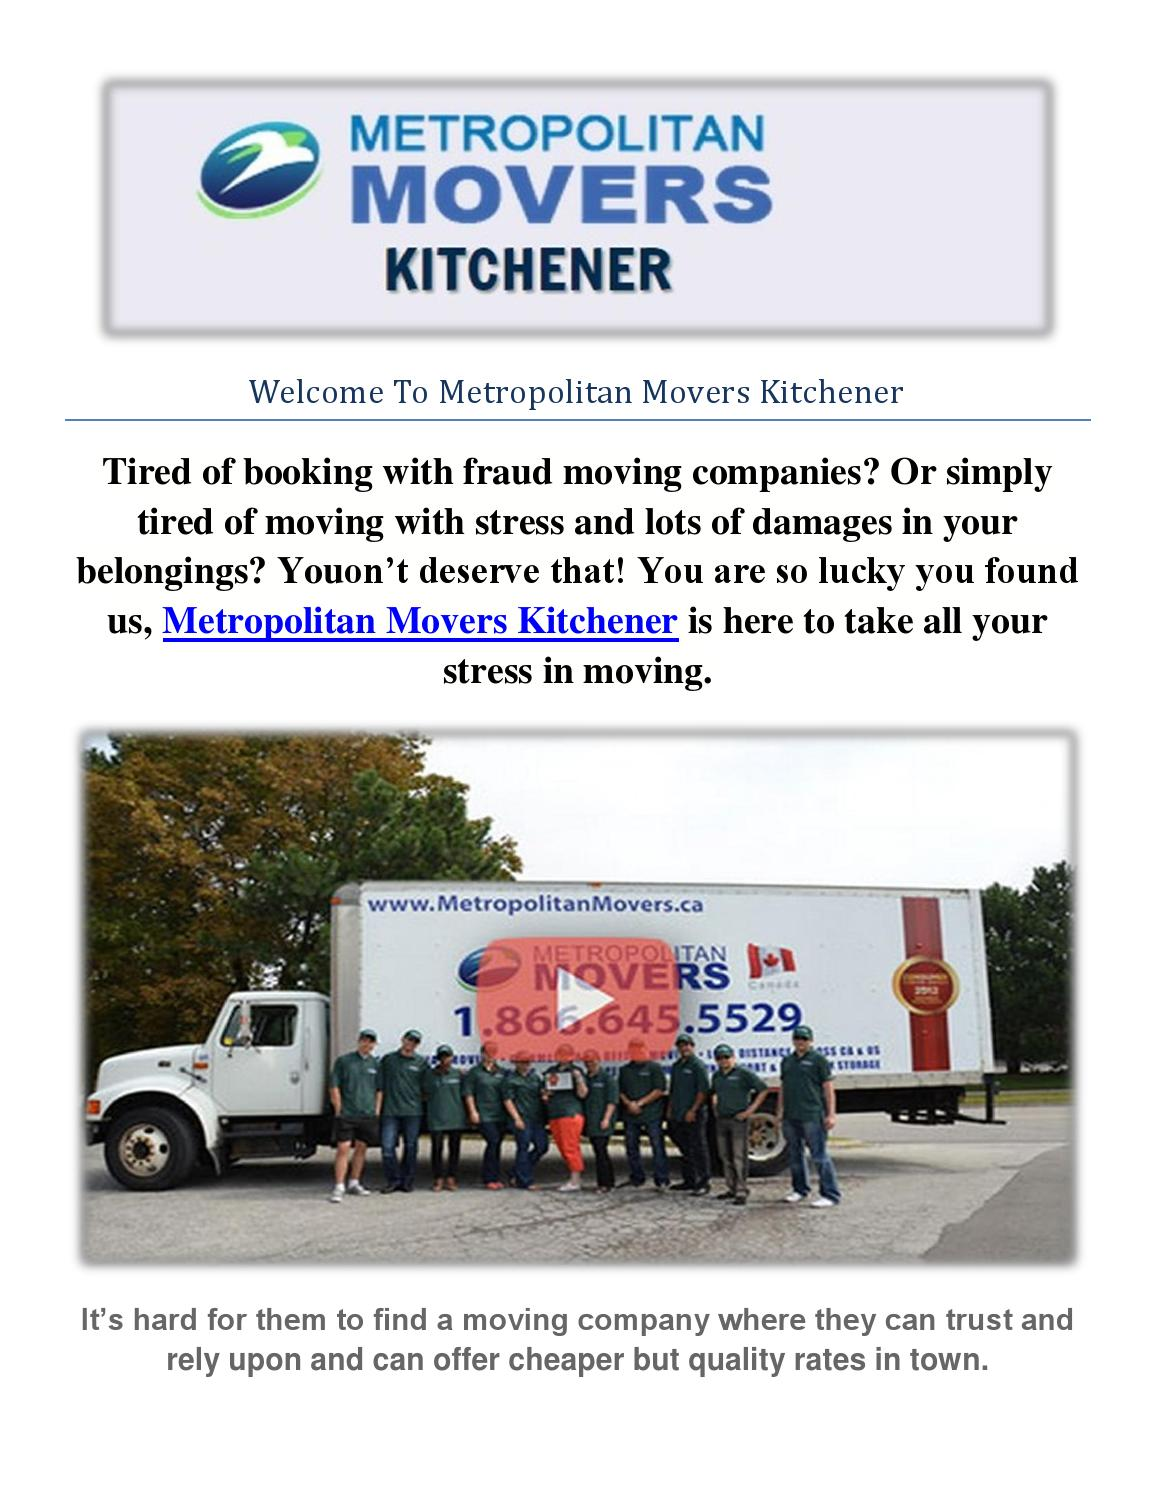 Best moving service metropolitan movers kitchener by Metropolitan ...